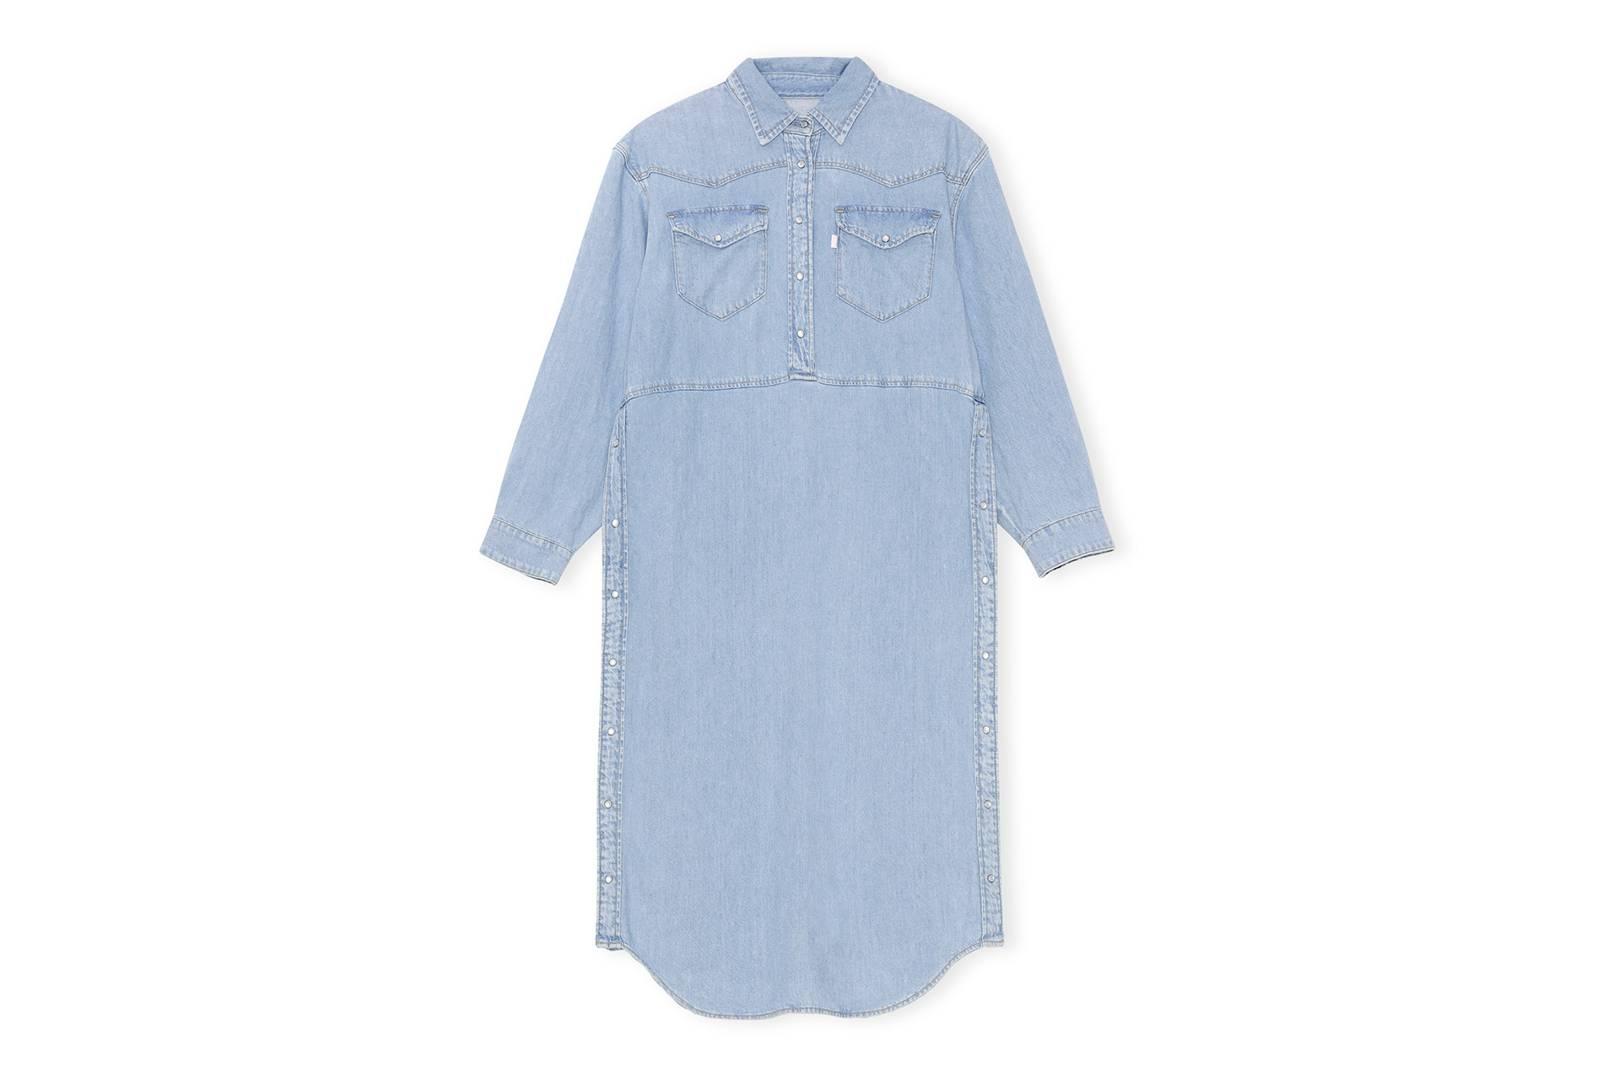 Ganni X Levi's Light Indigo Denim Dress, £275